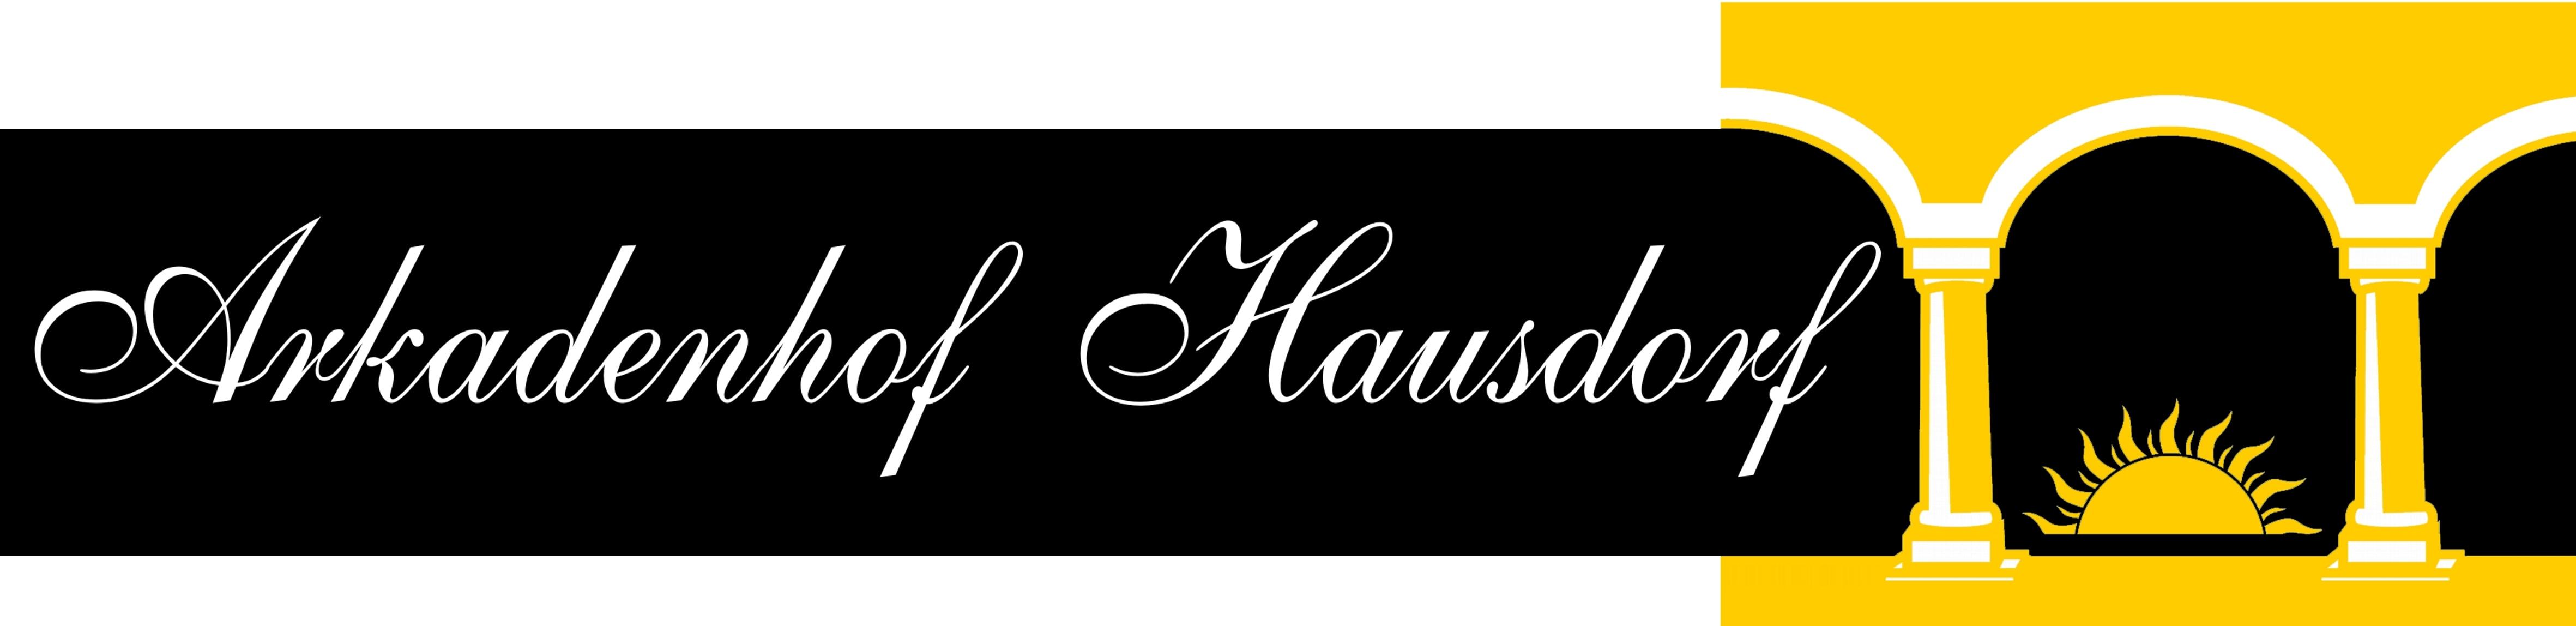 Akardenhof Hausdorf - Logo